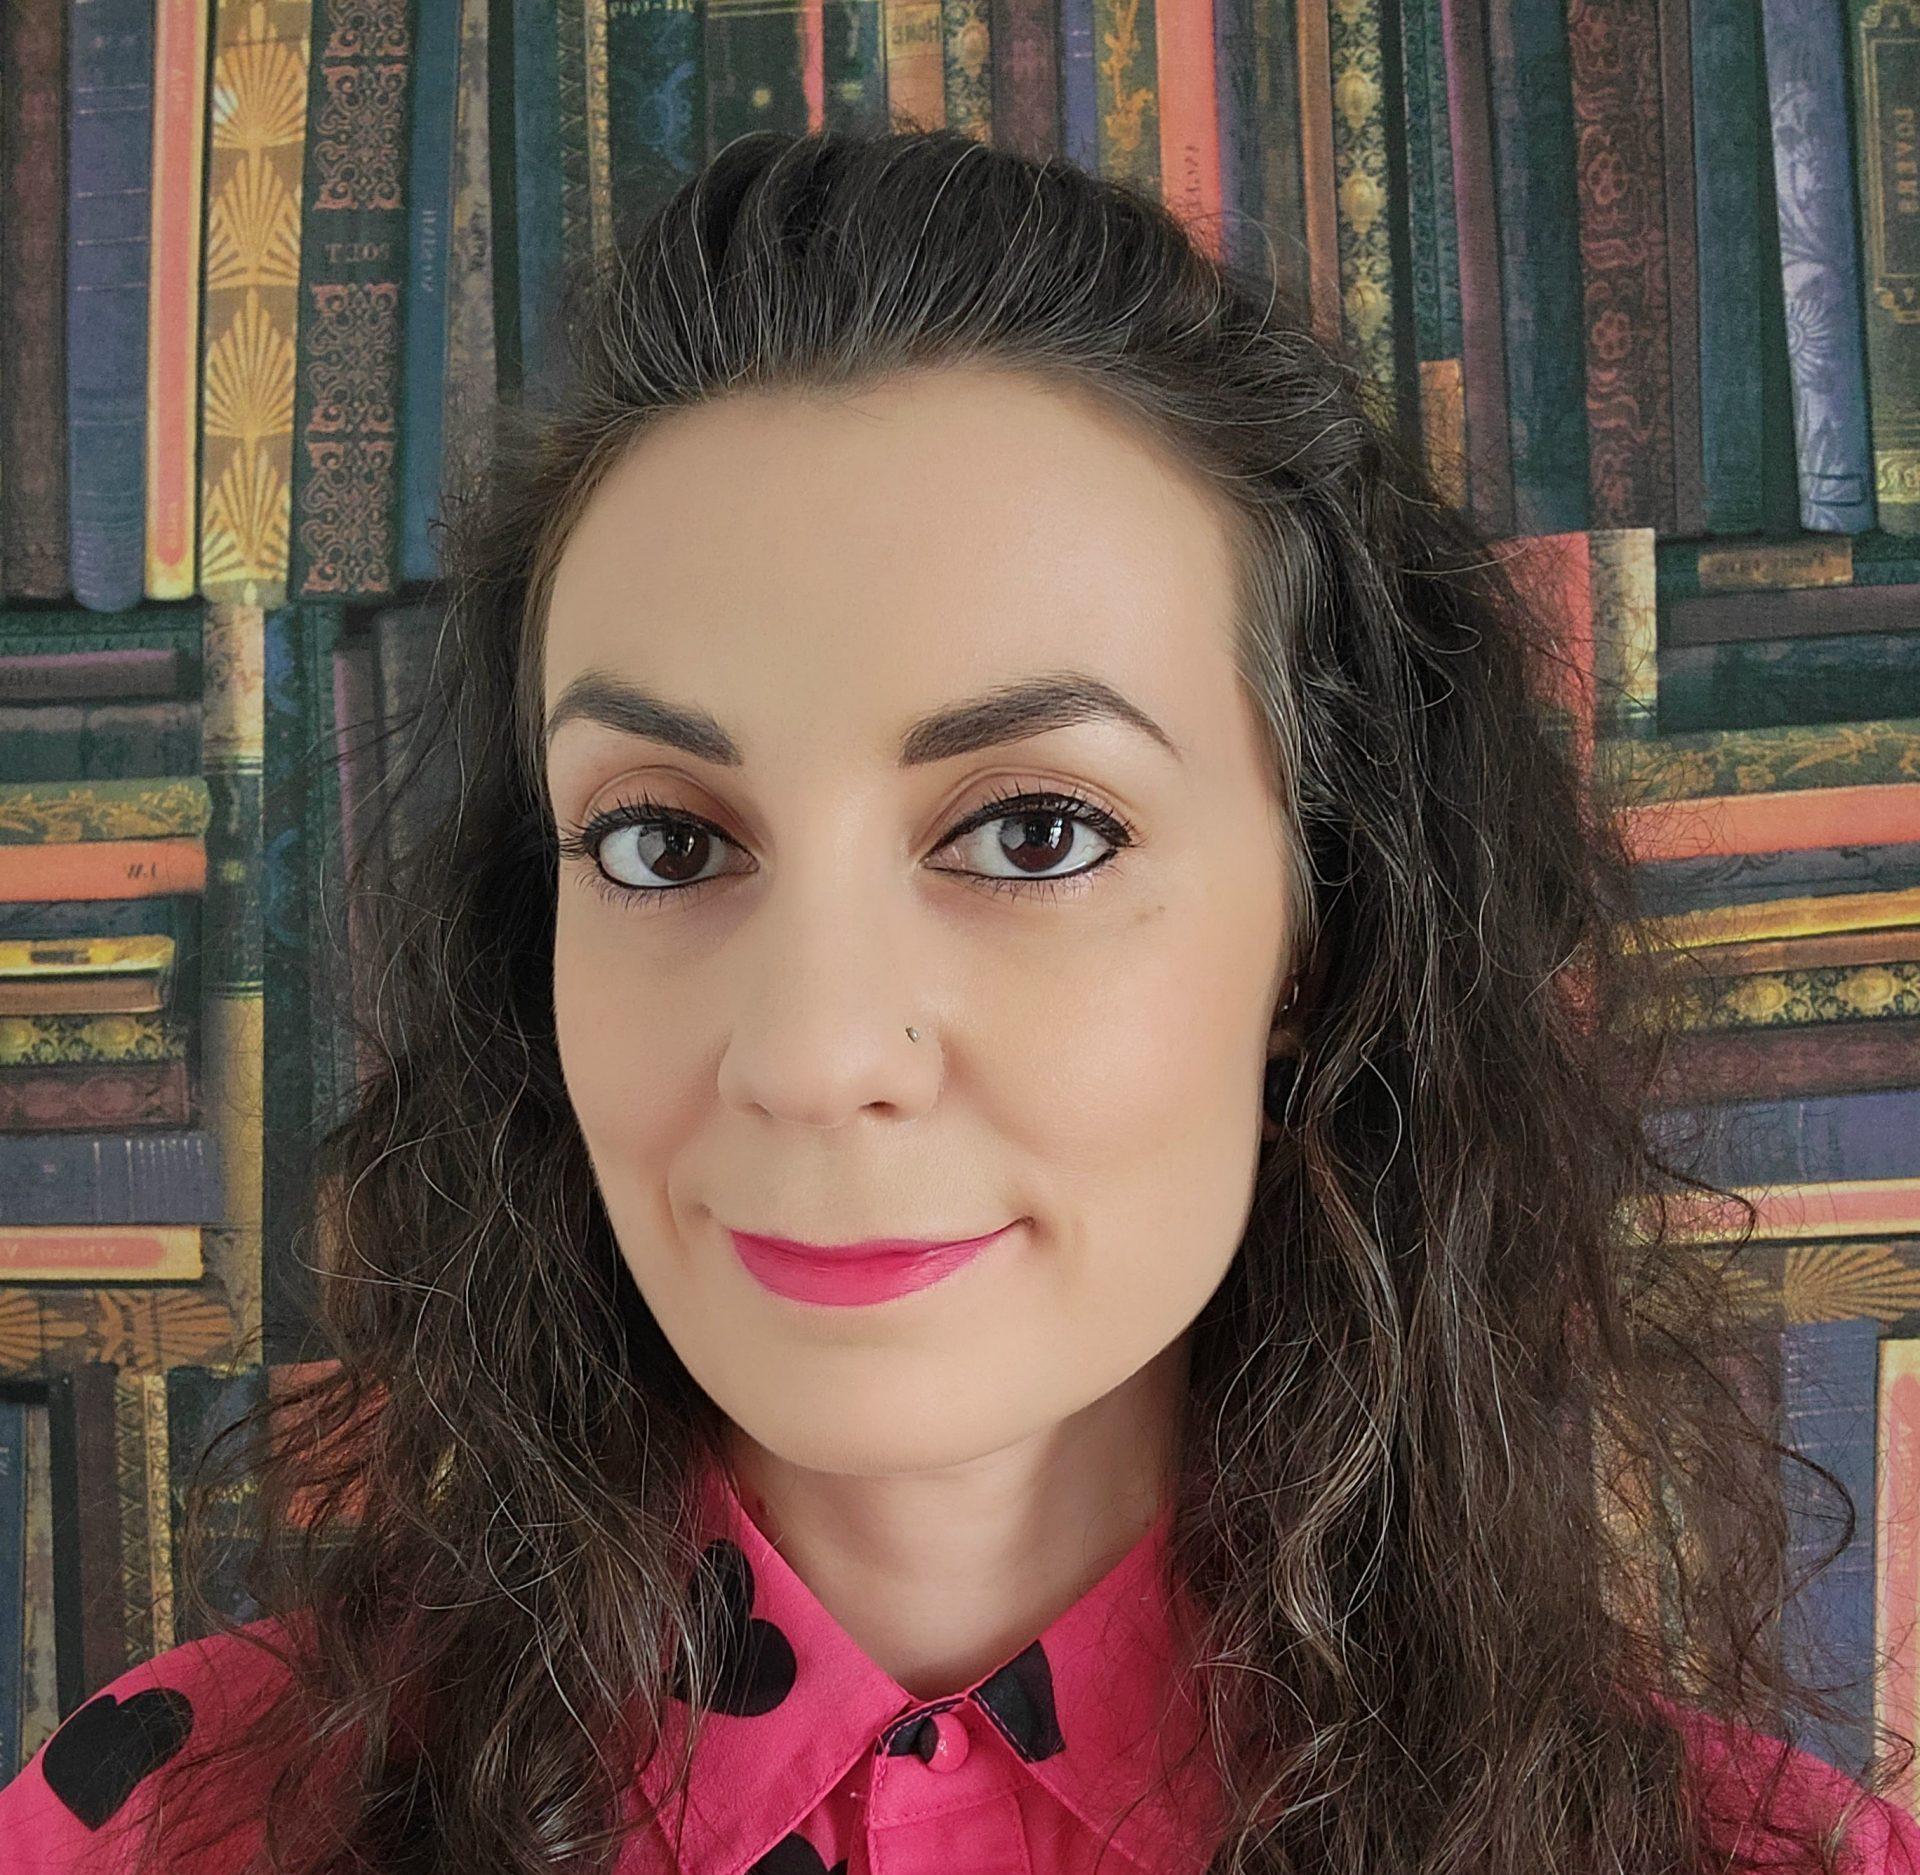 Sadi Fox Flourish Psychology Supervised Therapist